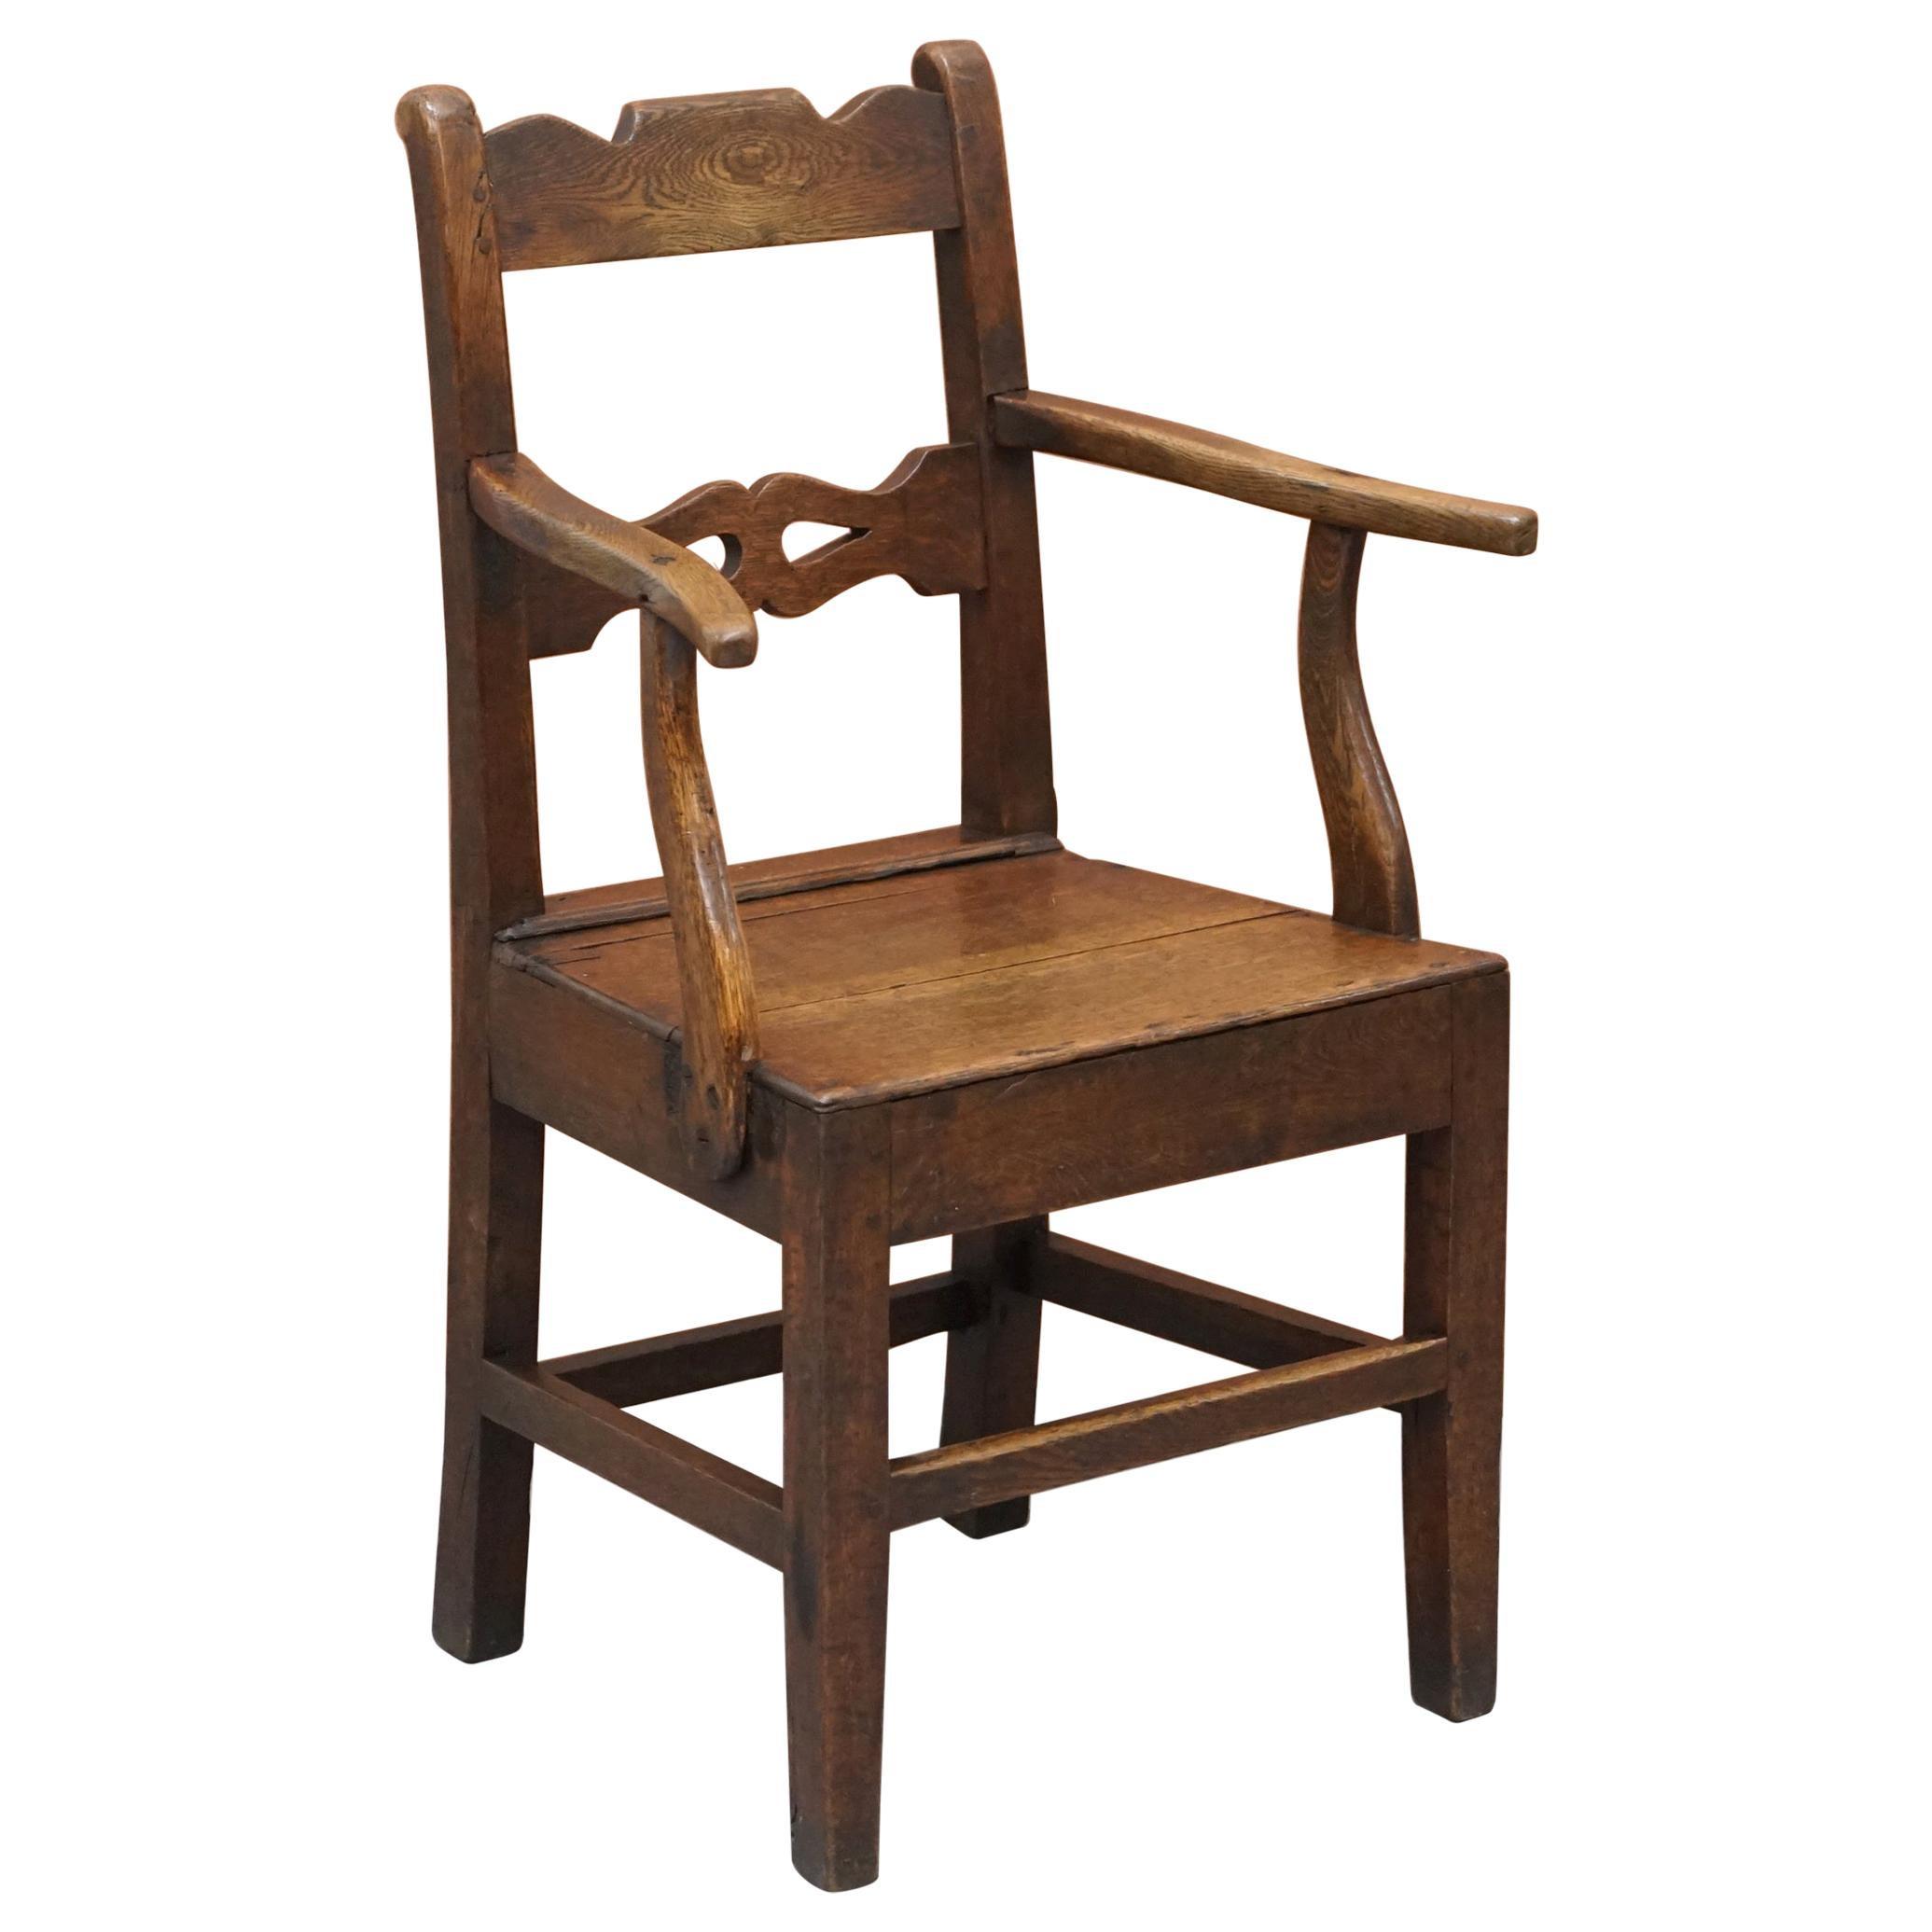 Lovely George II circa 1760 Primitive Carver Armchair Original Period Repairs